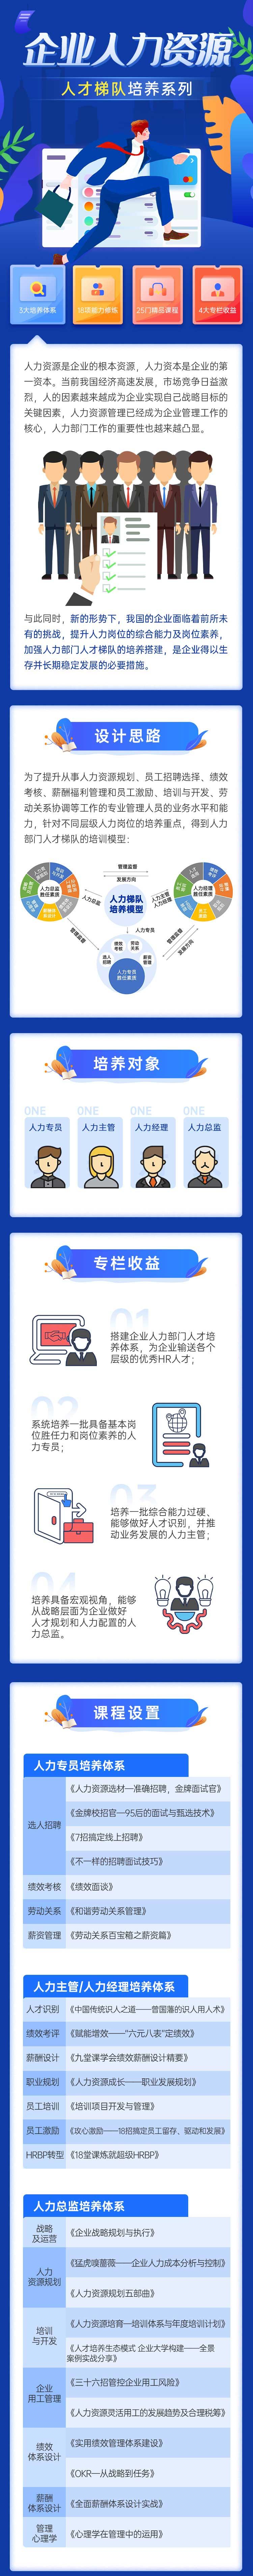 https://hs-1253359580.cos.ap-guangzhou.myqcloud.com/newhdp/live_cover/7088/5618b24dc83dc363f7b1c193193757a7.jpeg